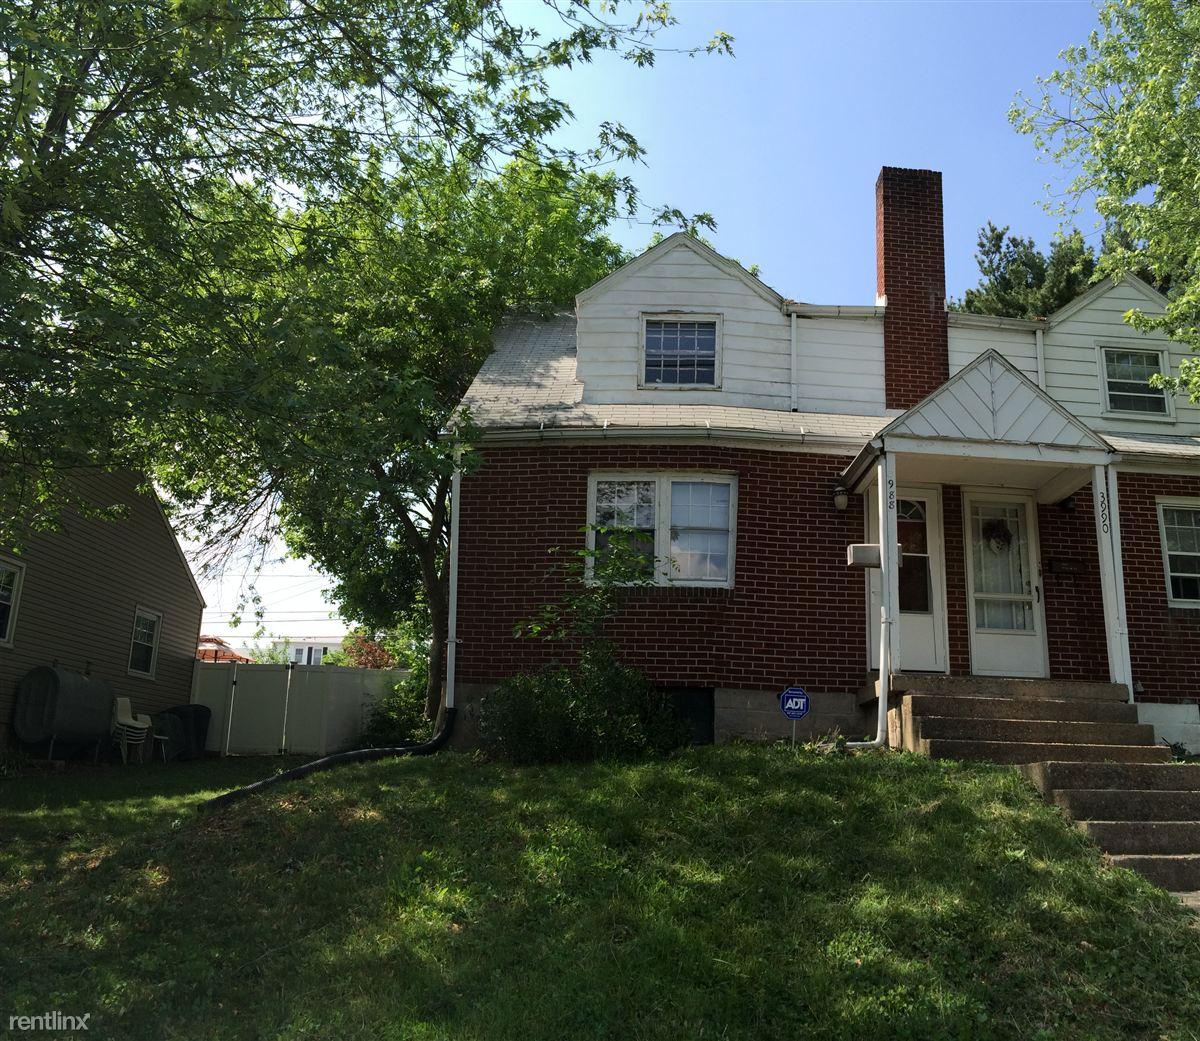 Duplex for Rent in Harrisburg